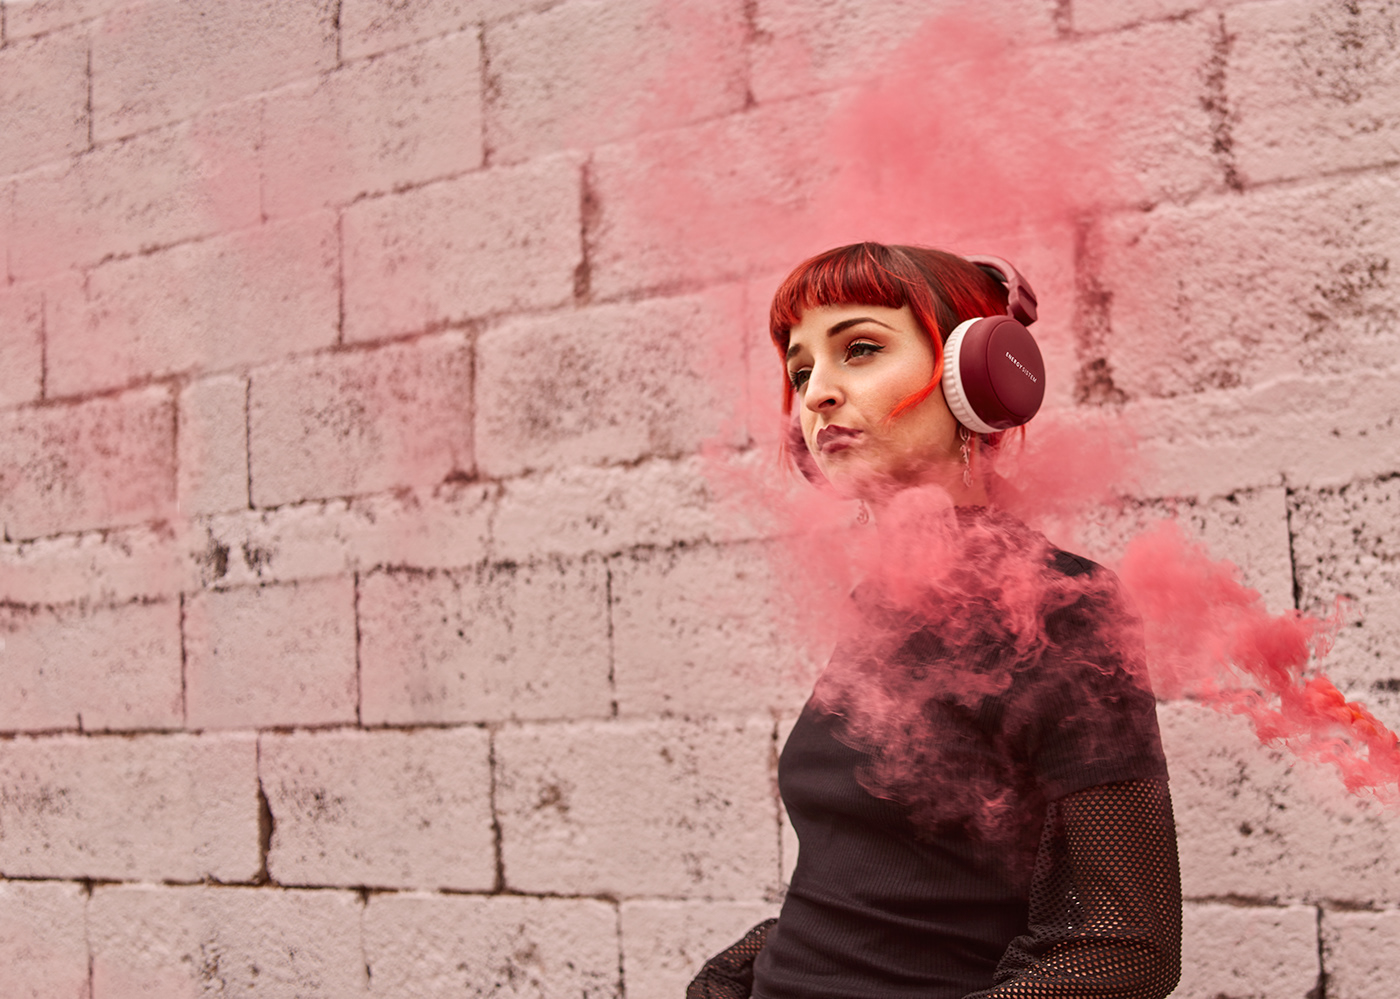 photo color product photoshop capture one Canon smoke Audio headphones model